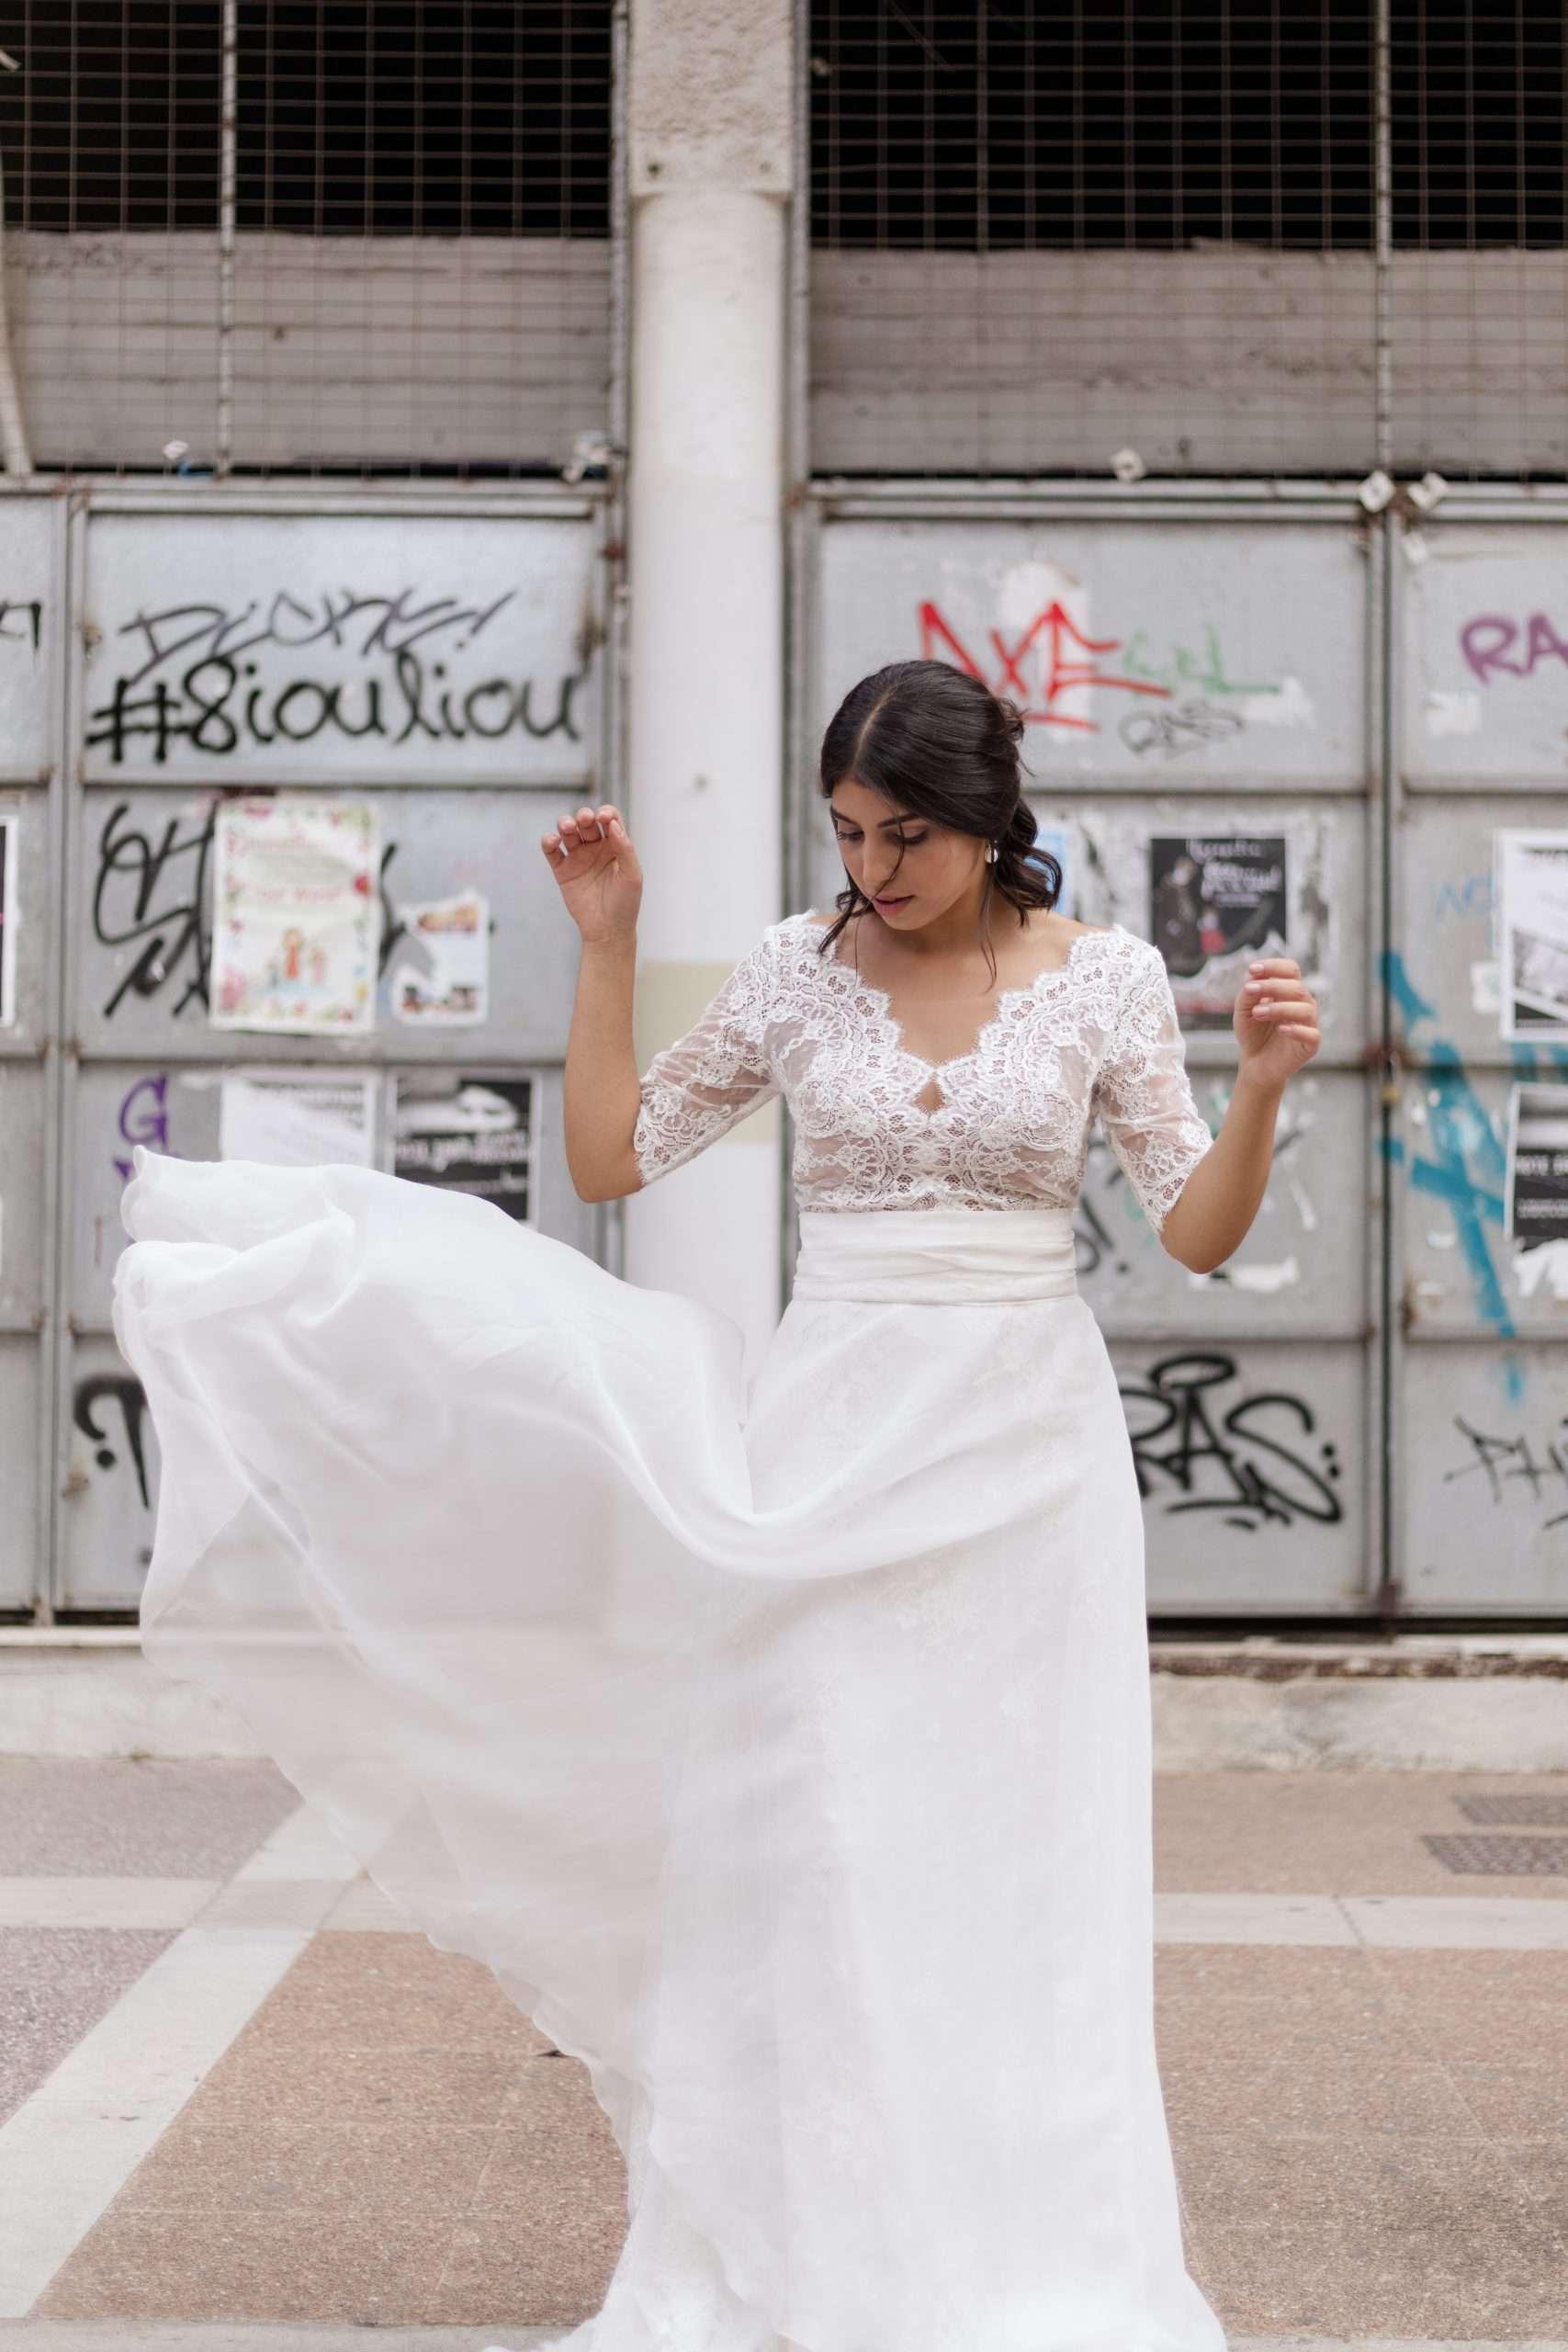 Nymphi Online Bridal Store